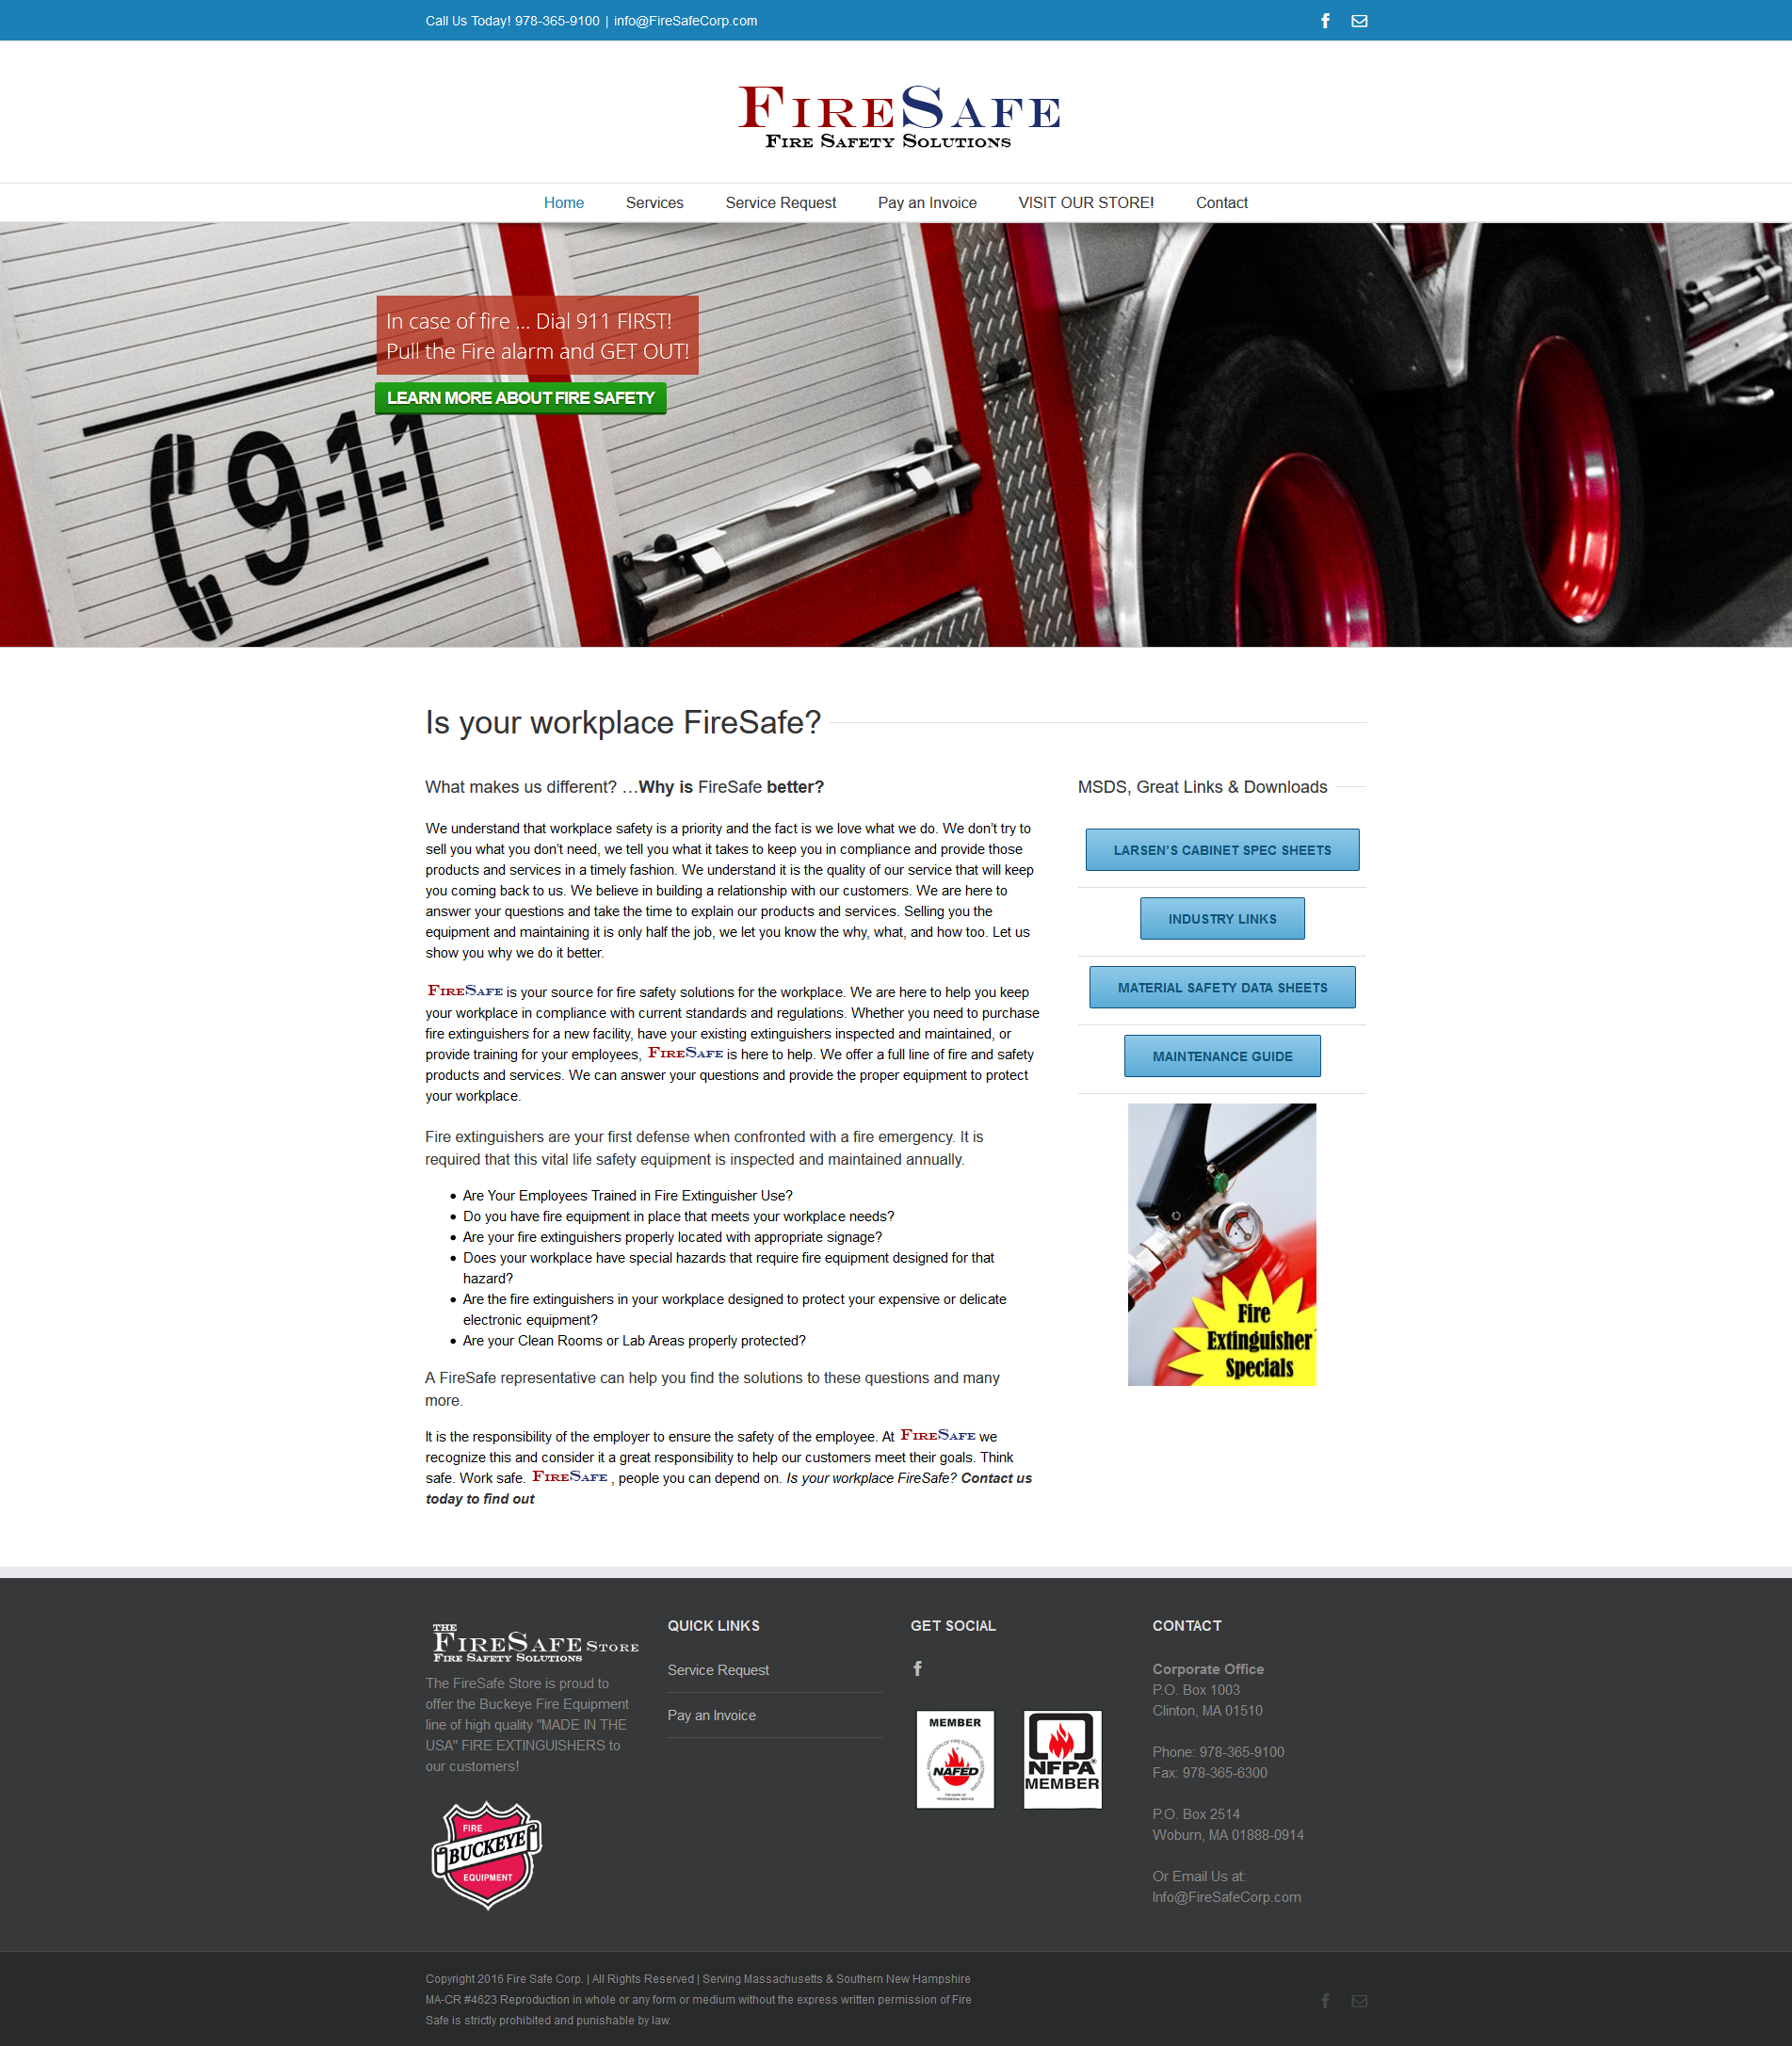 Fire Safe Corp 2016-06-07 17-37-06